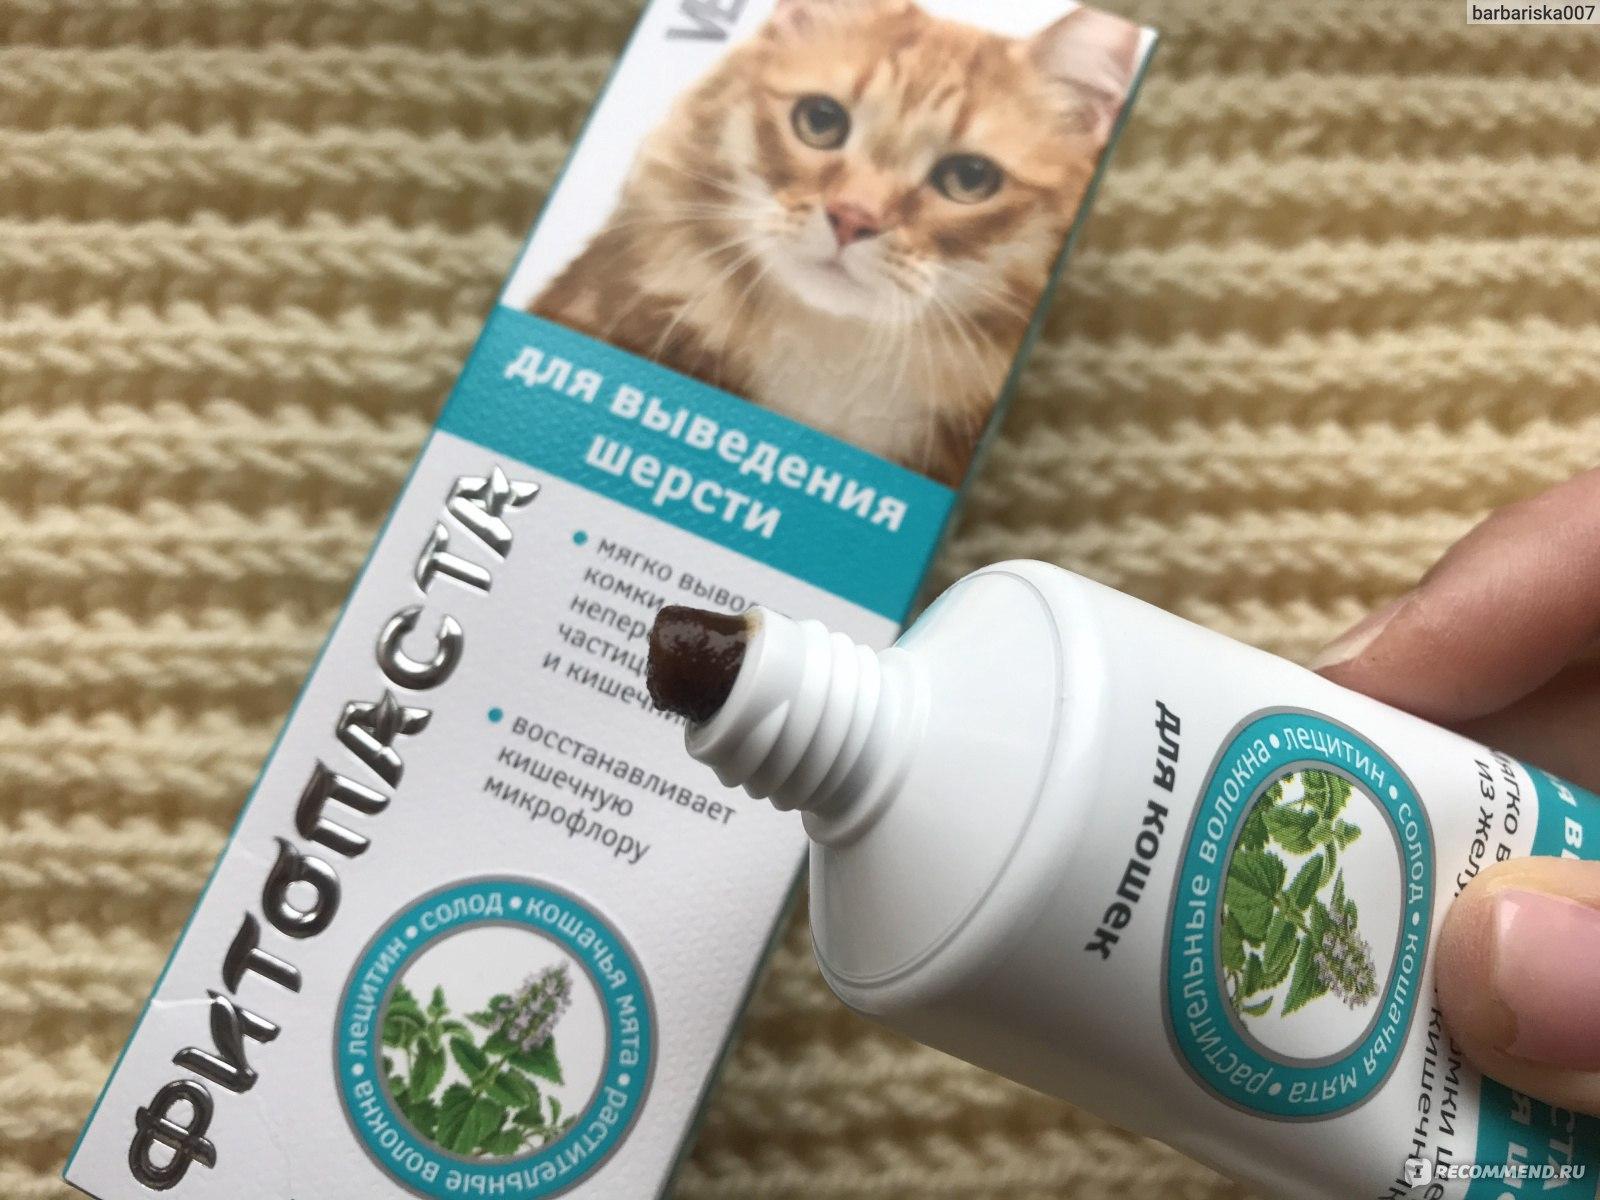 Как вывести шерсть из желудка и кишечника кошки